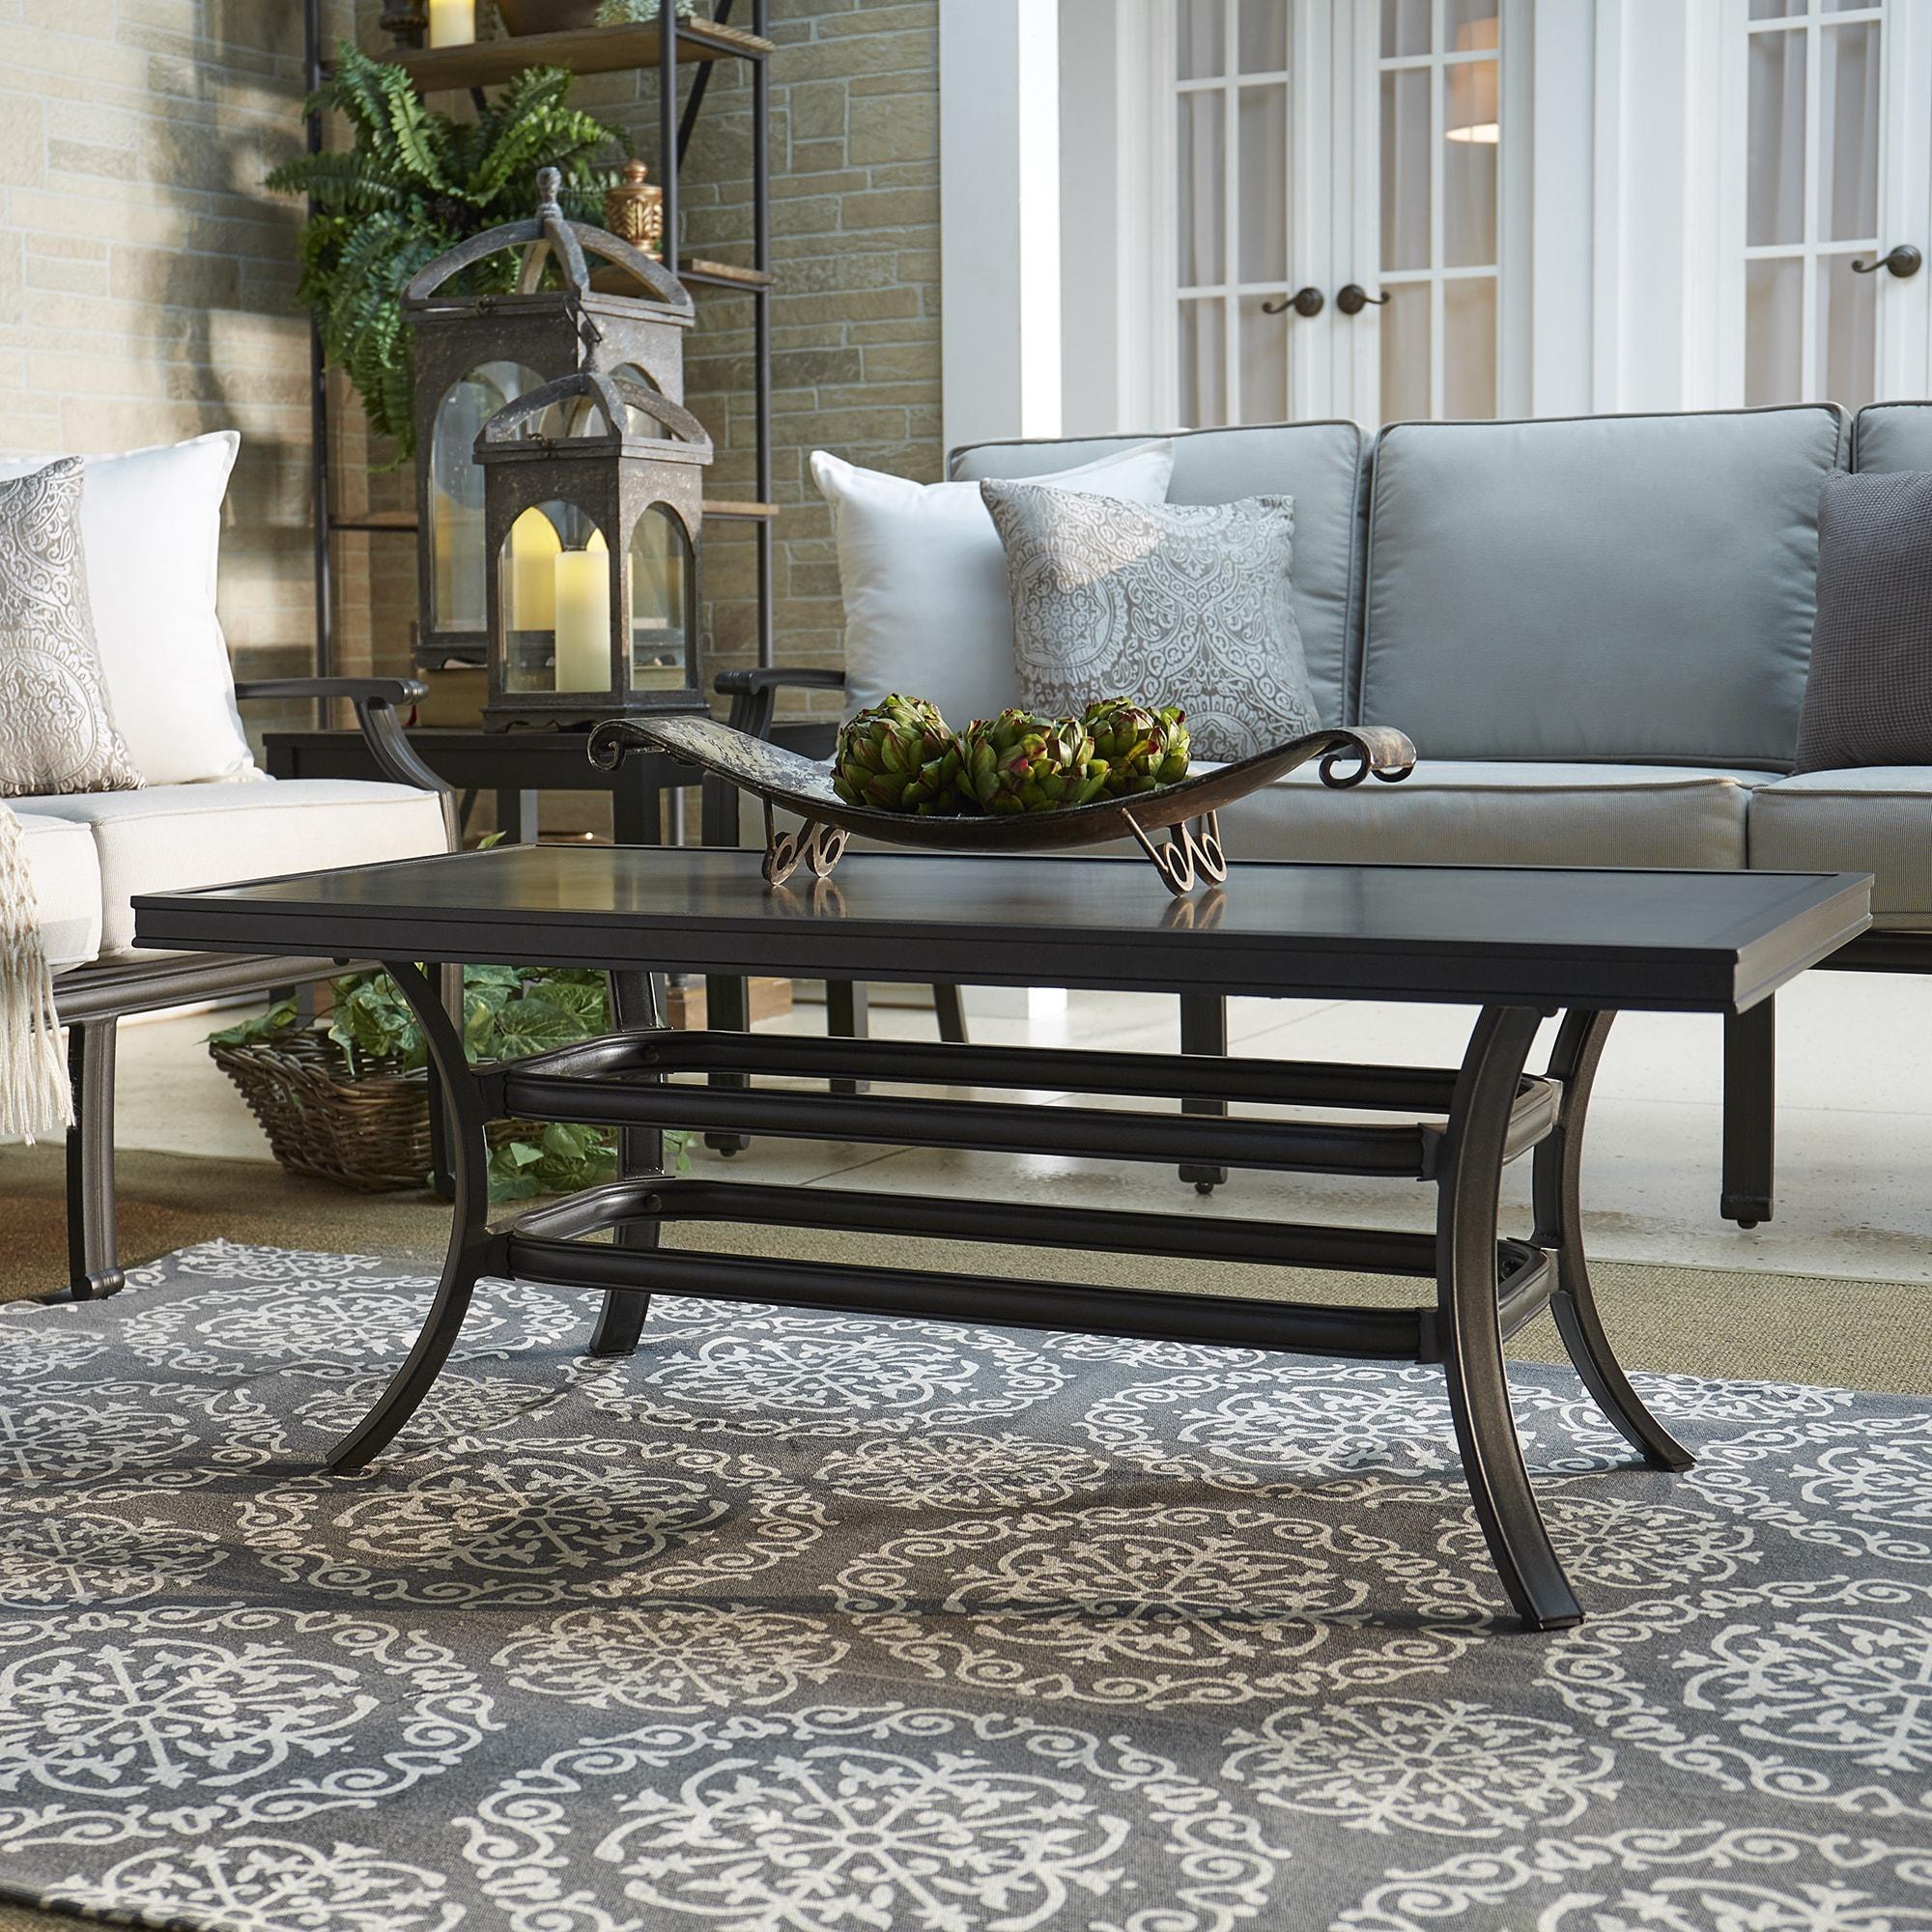 Matira-Metal-Patio-Cushioned-Concrete-Ottoman-Coffee-Table-